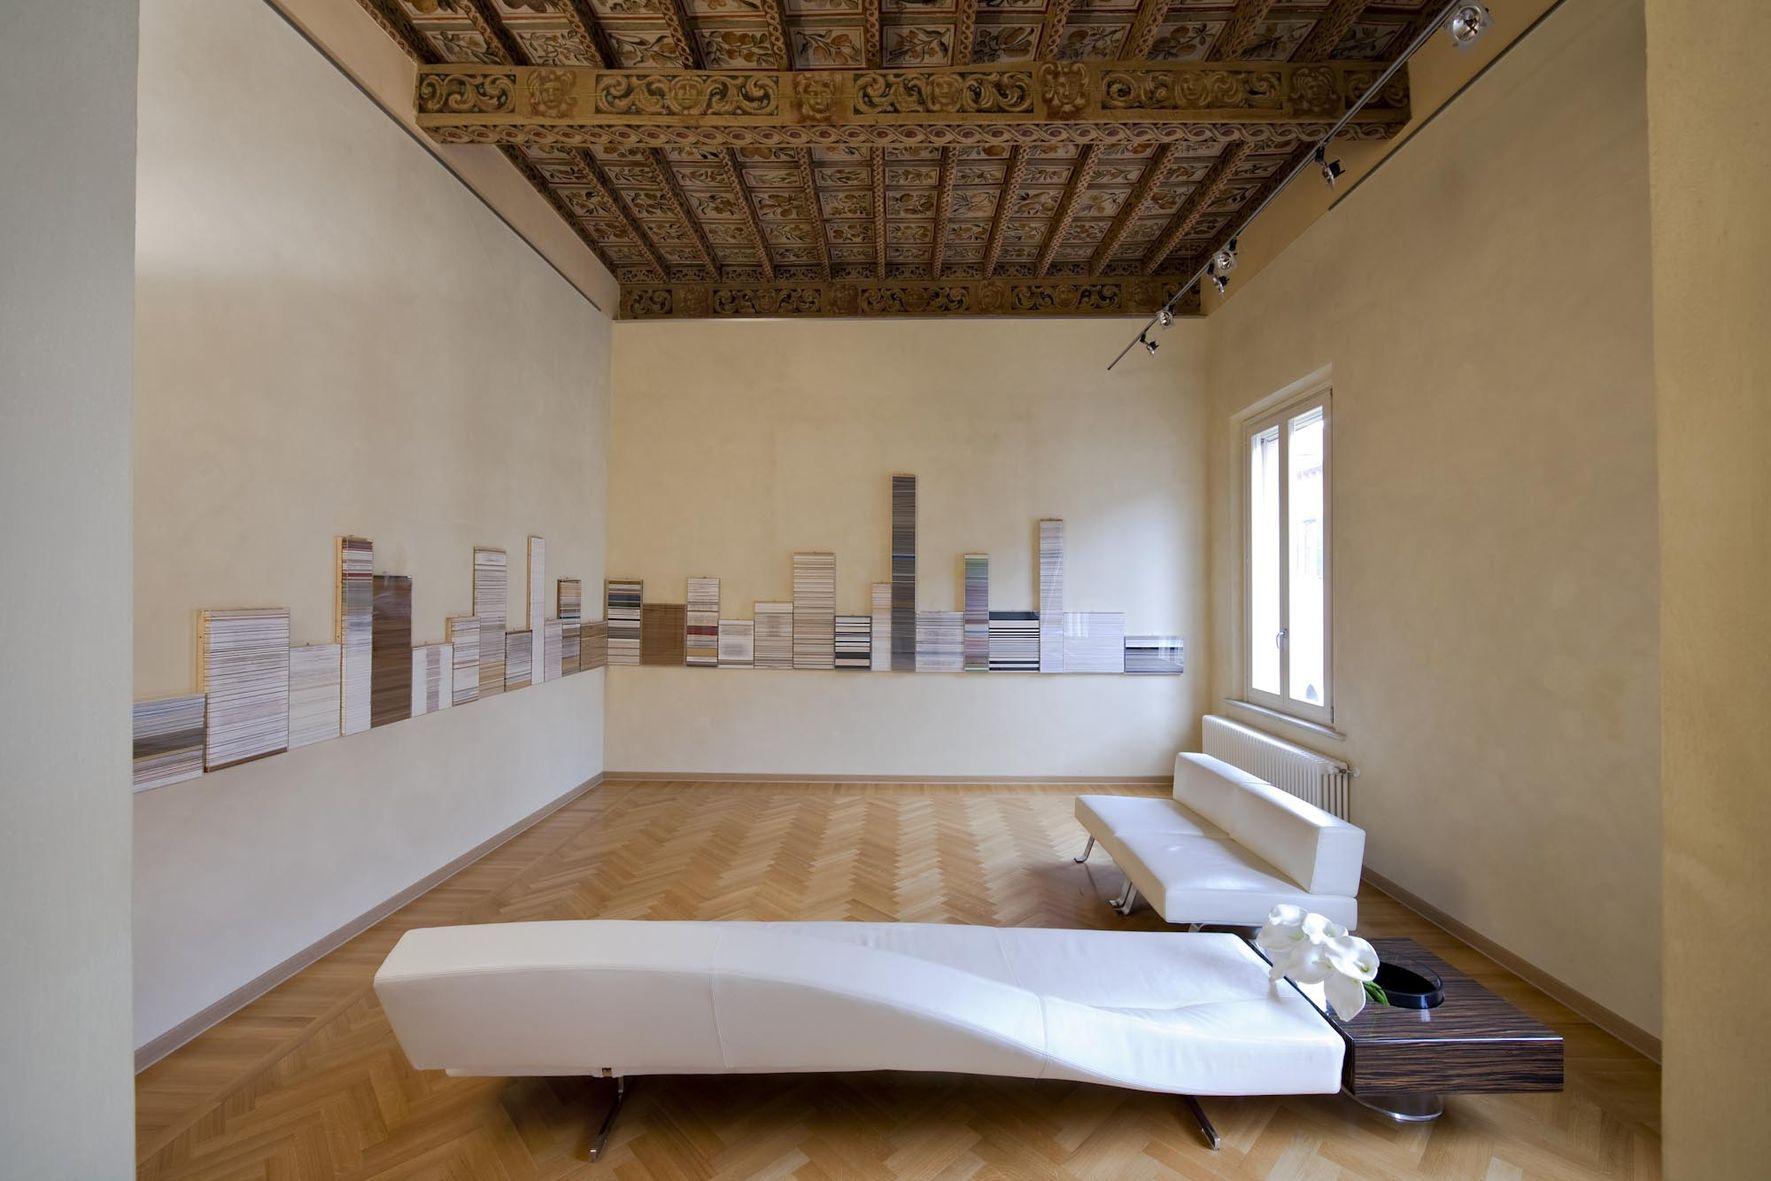 MLB Gallery, Ferrara